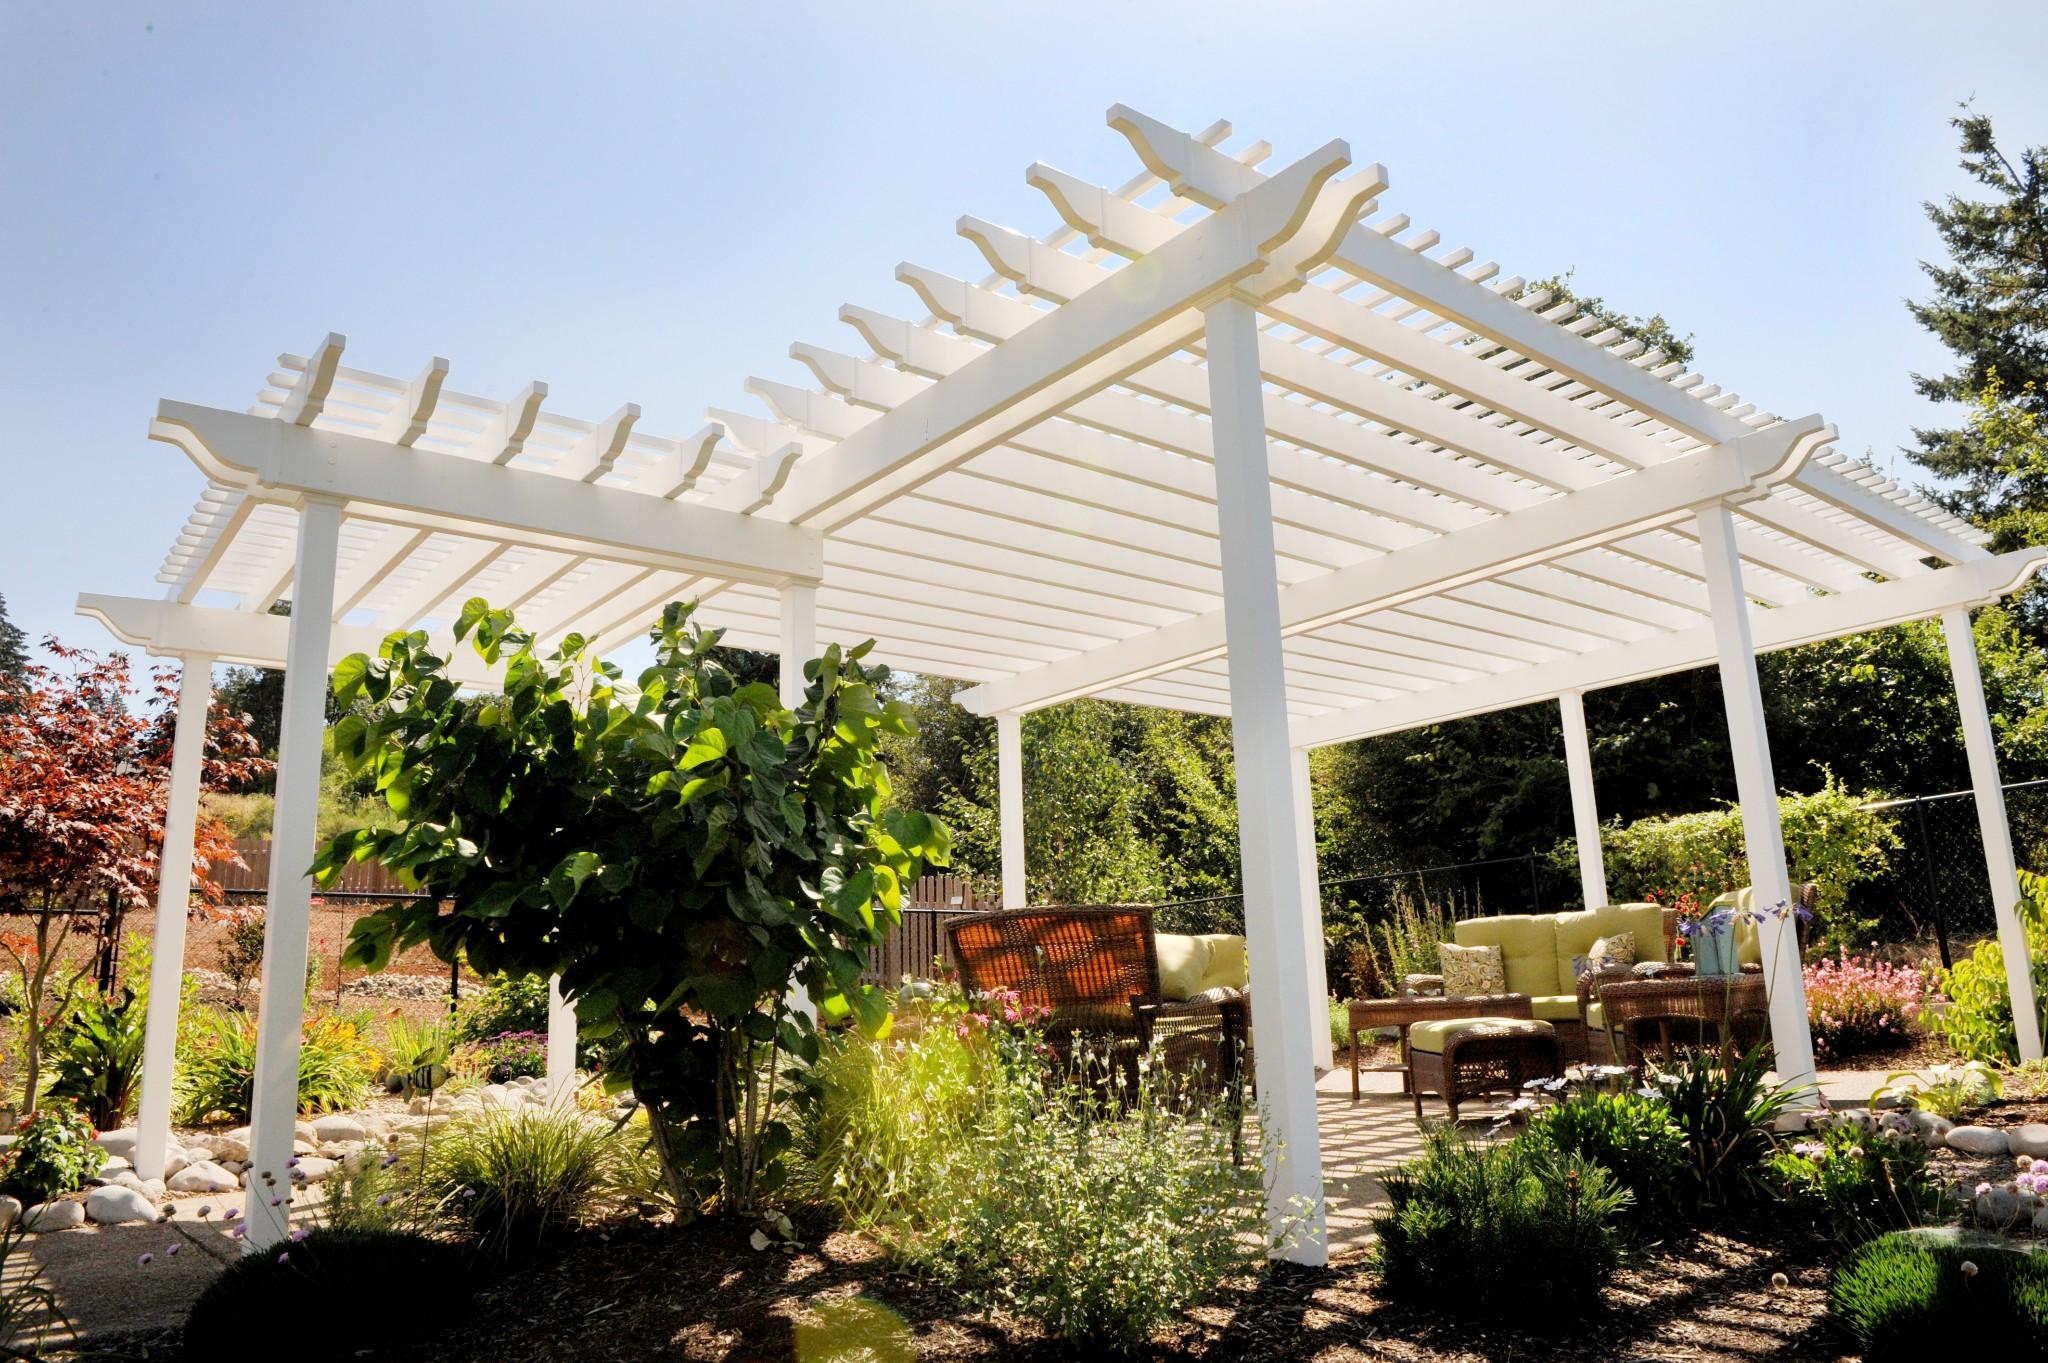 Pergola Covers Create Your Very Own Secret Garden